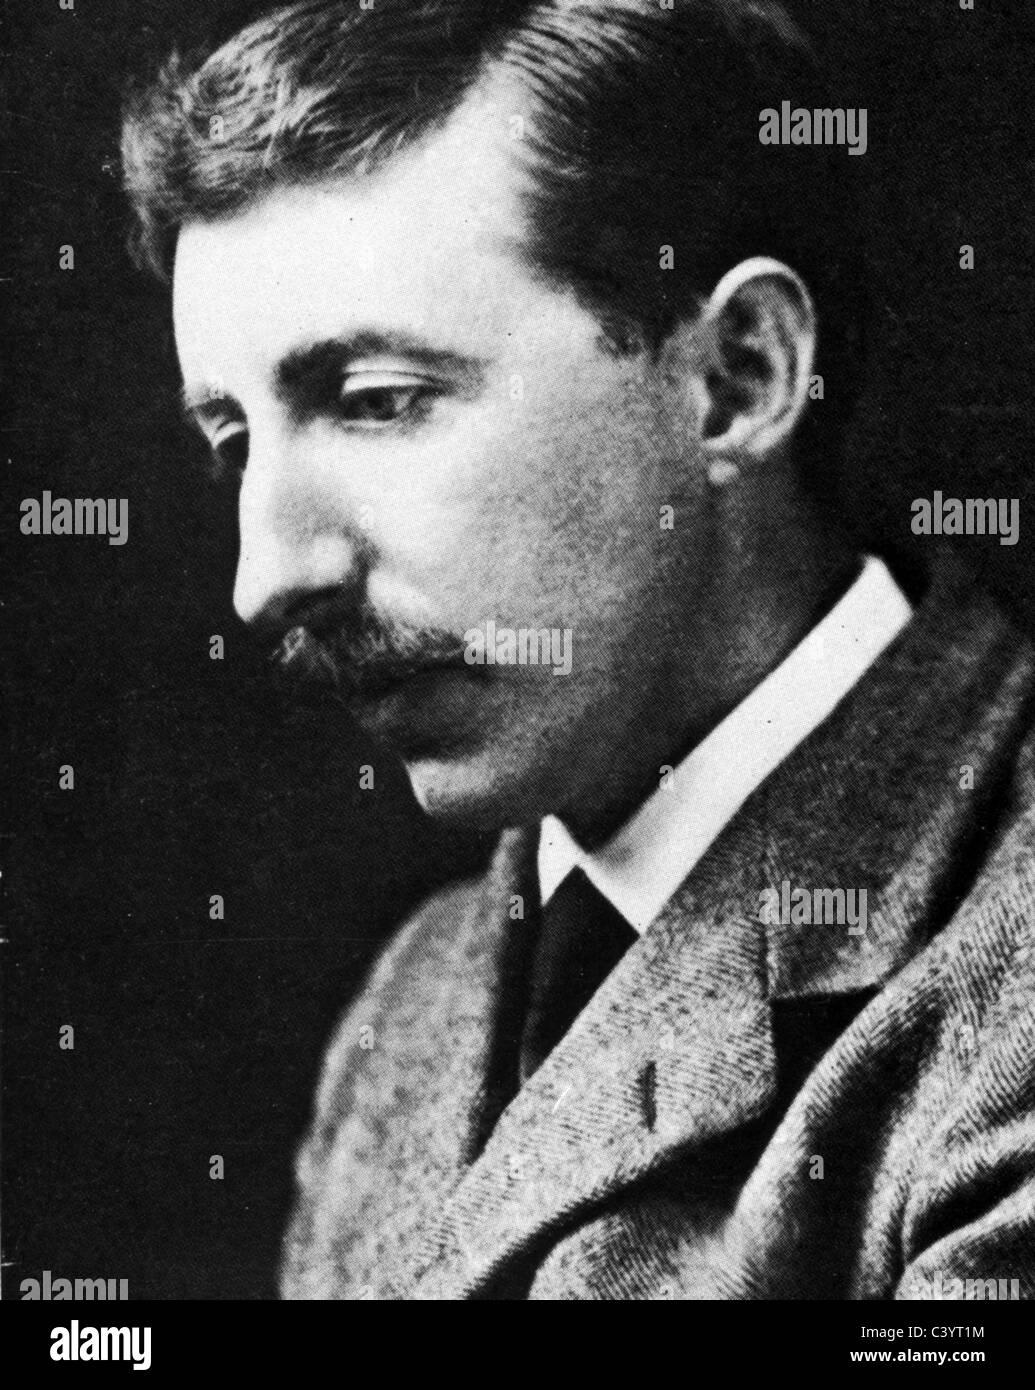 E.M. FORSTER (1879-1970) English novelist - Stock Image